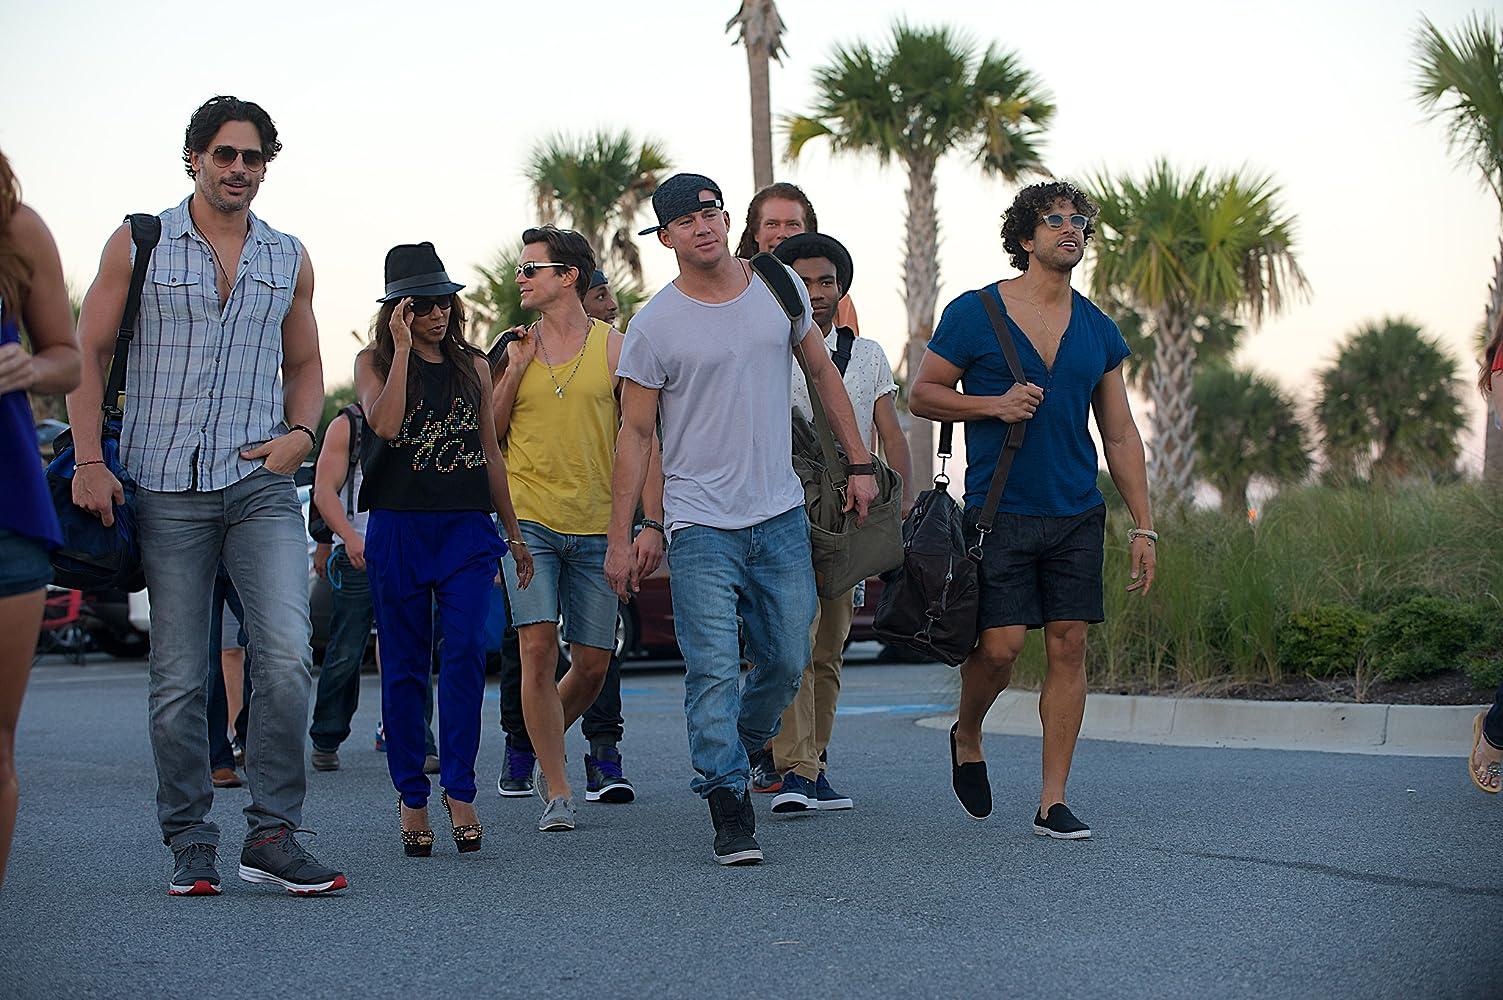 Jada Pinkett Smith, Matt Bomer, Joe Manganiello, Kevin Nash, Adam Rodriguez, and Channing Tatum in Magic Mike XXL (2015)